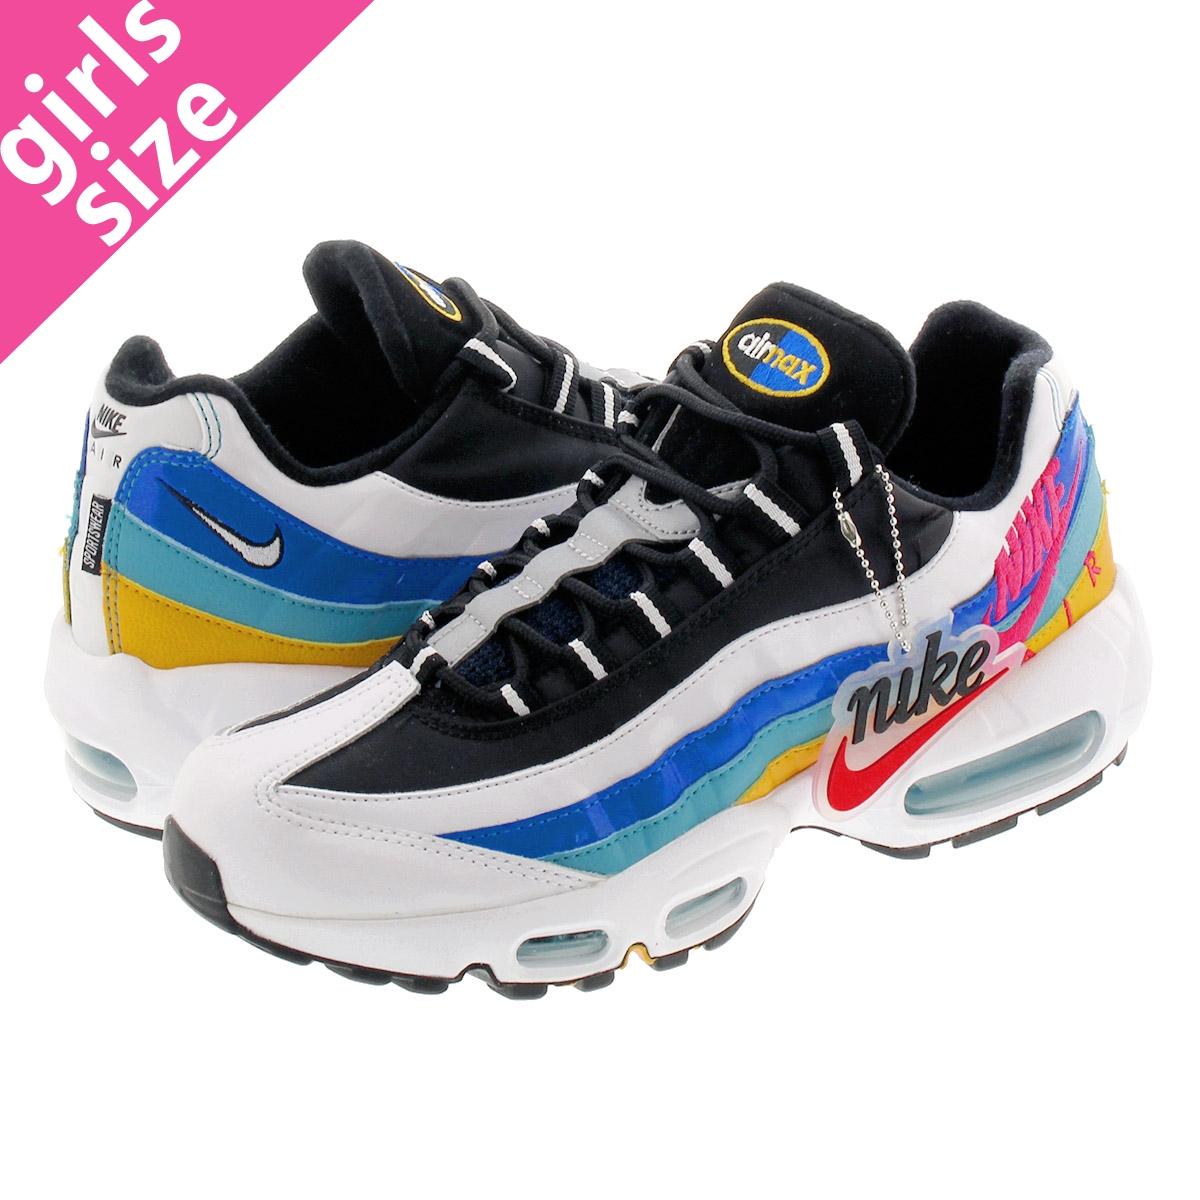 new style d3b74 8fa72 NIKE WMNS AIR MAX 95 Nike women Air Max 95 WHITE/UNIVERSITY GOLD/TEAL  NEBULA/RED ORBIT ci1900-123